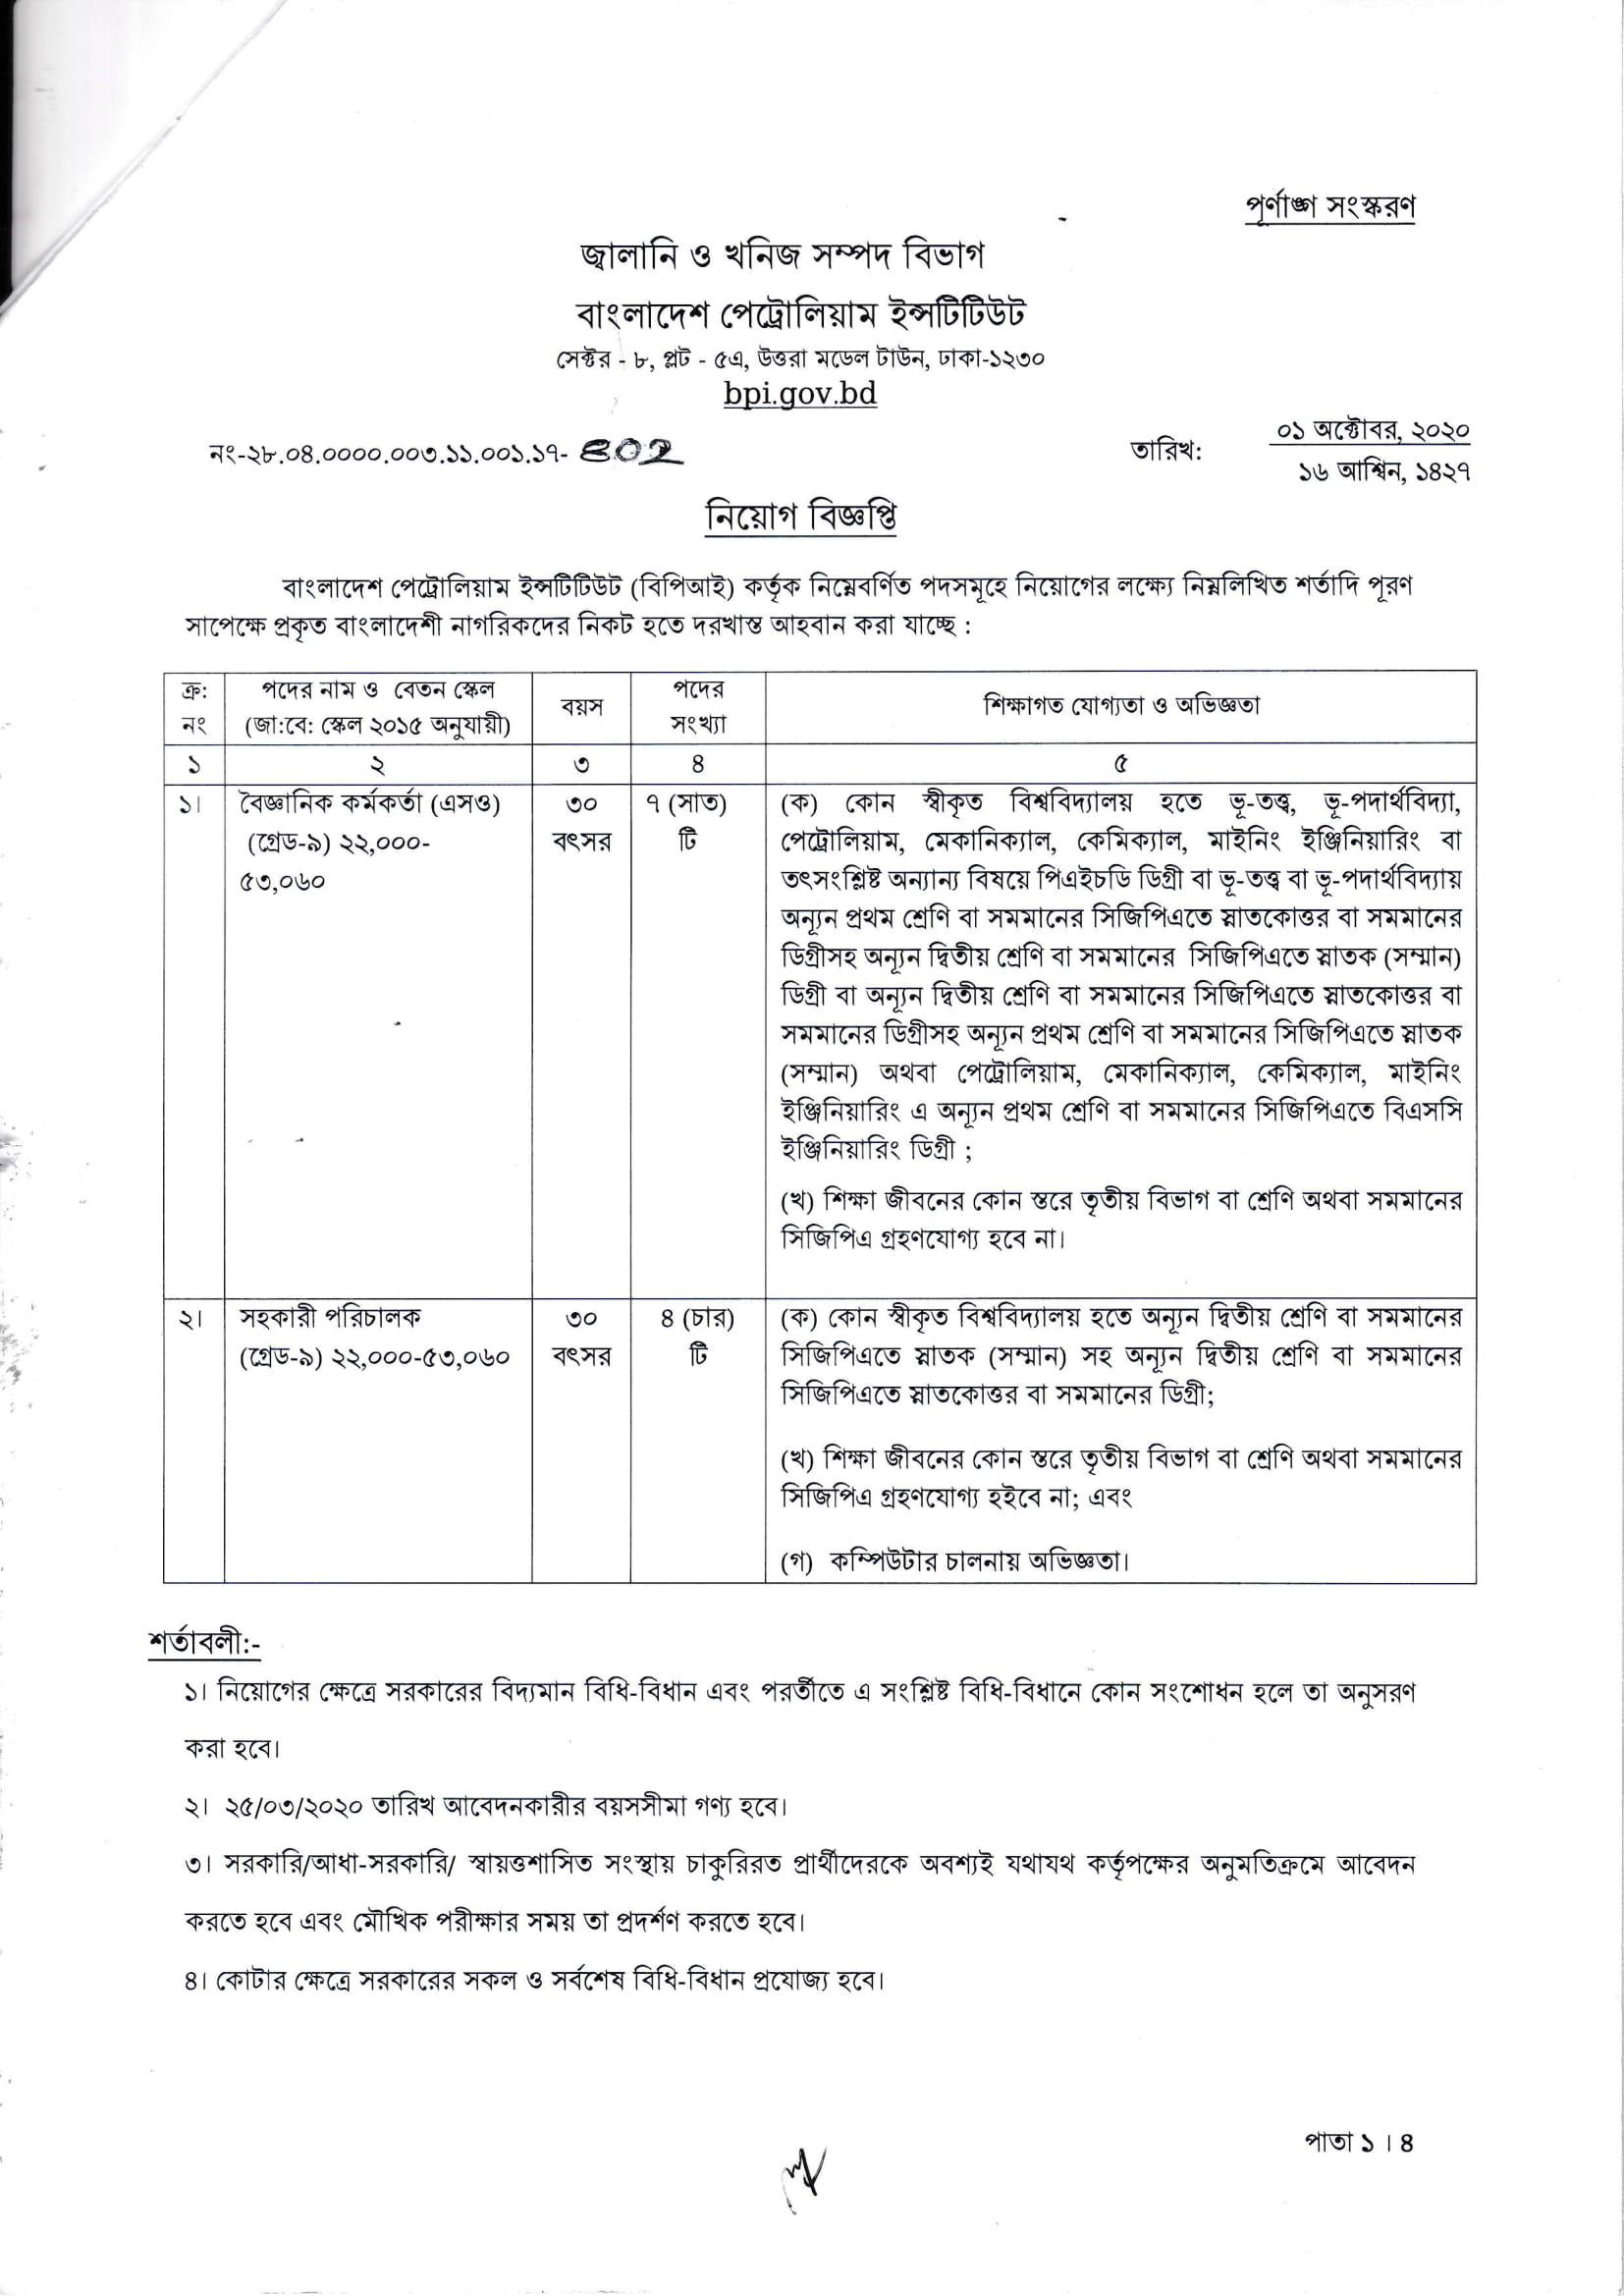 BPI Teletalk 2020 - bpi.teletalk.com.bd